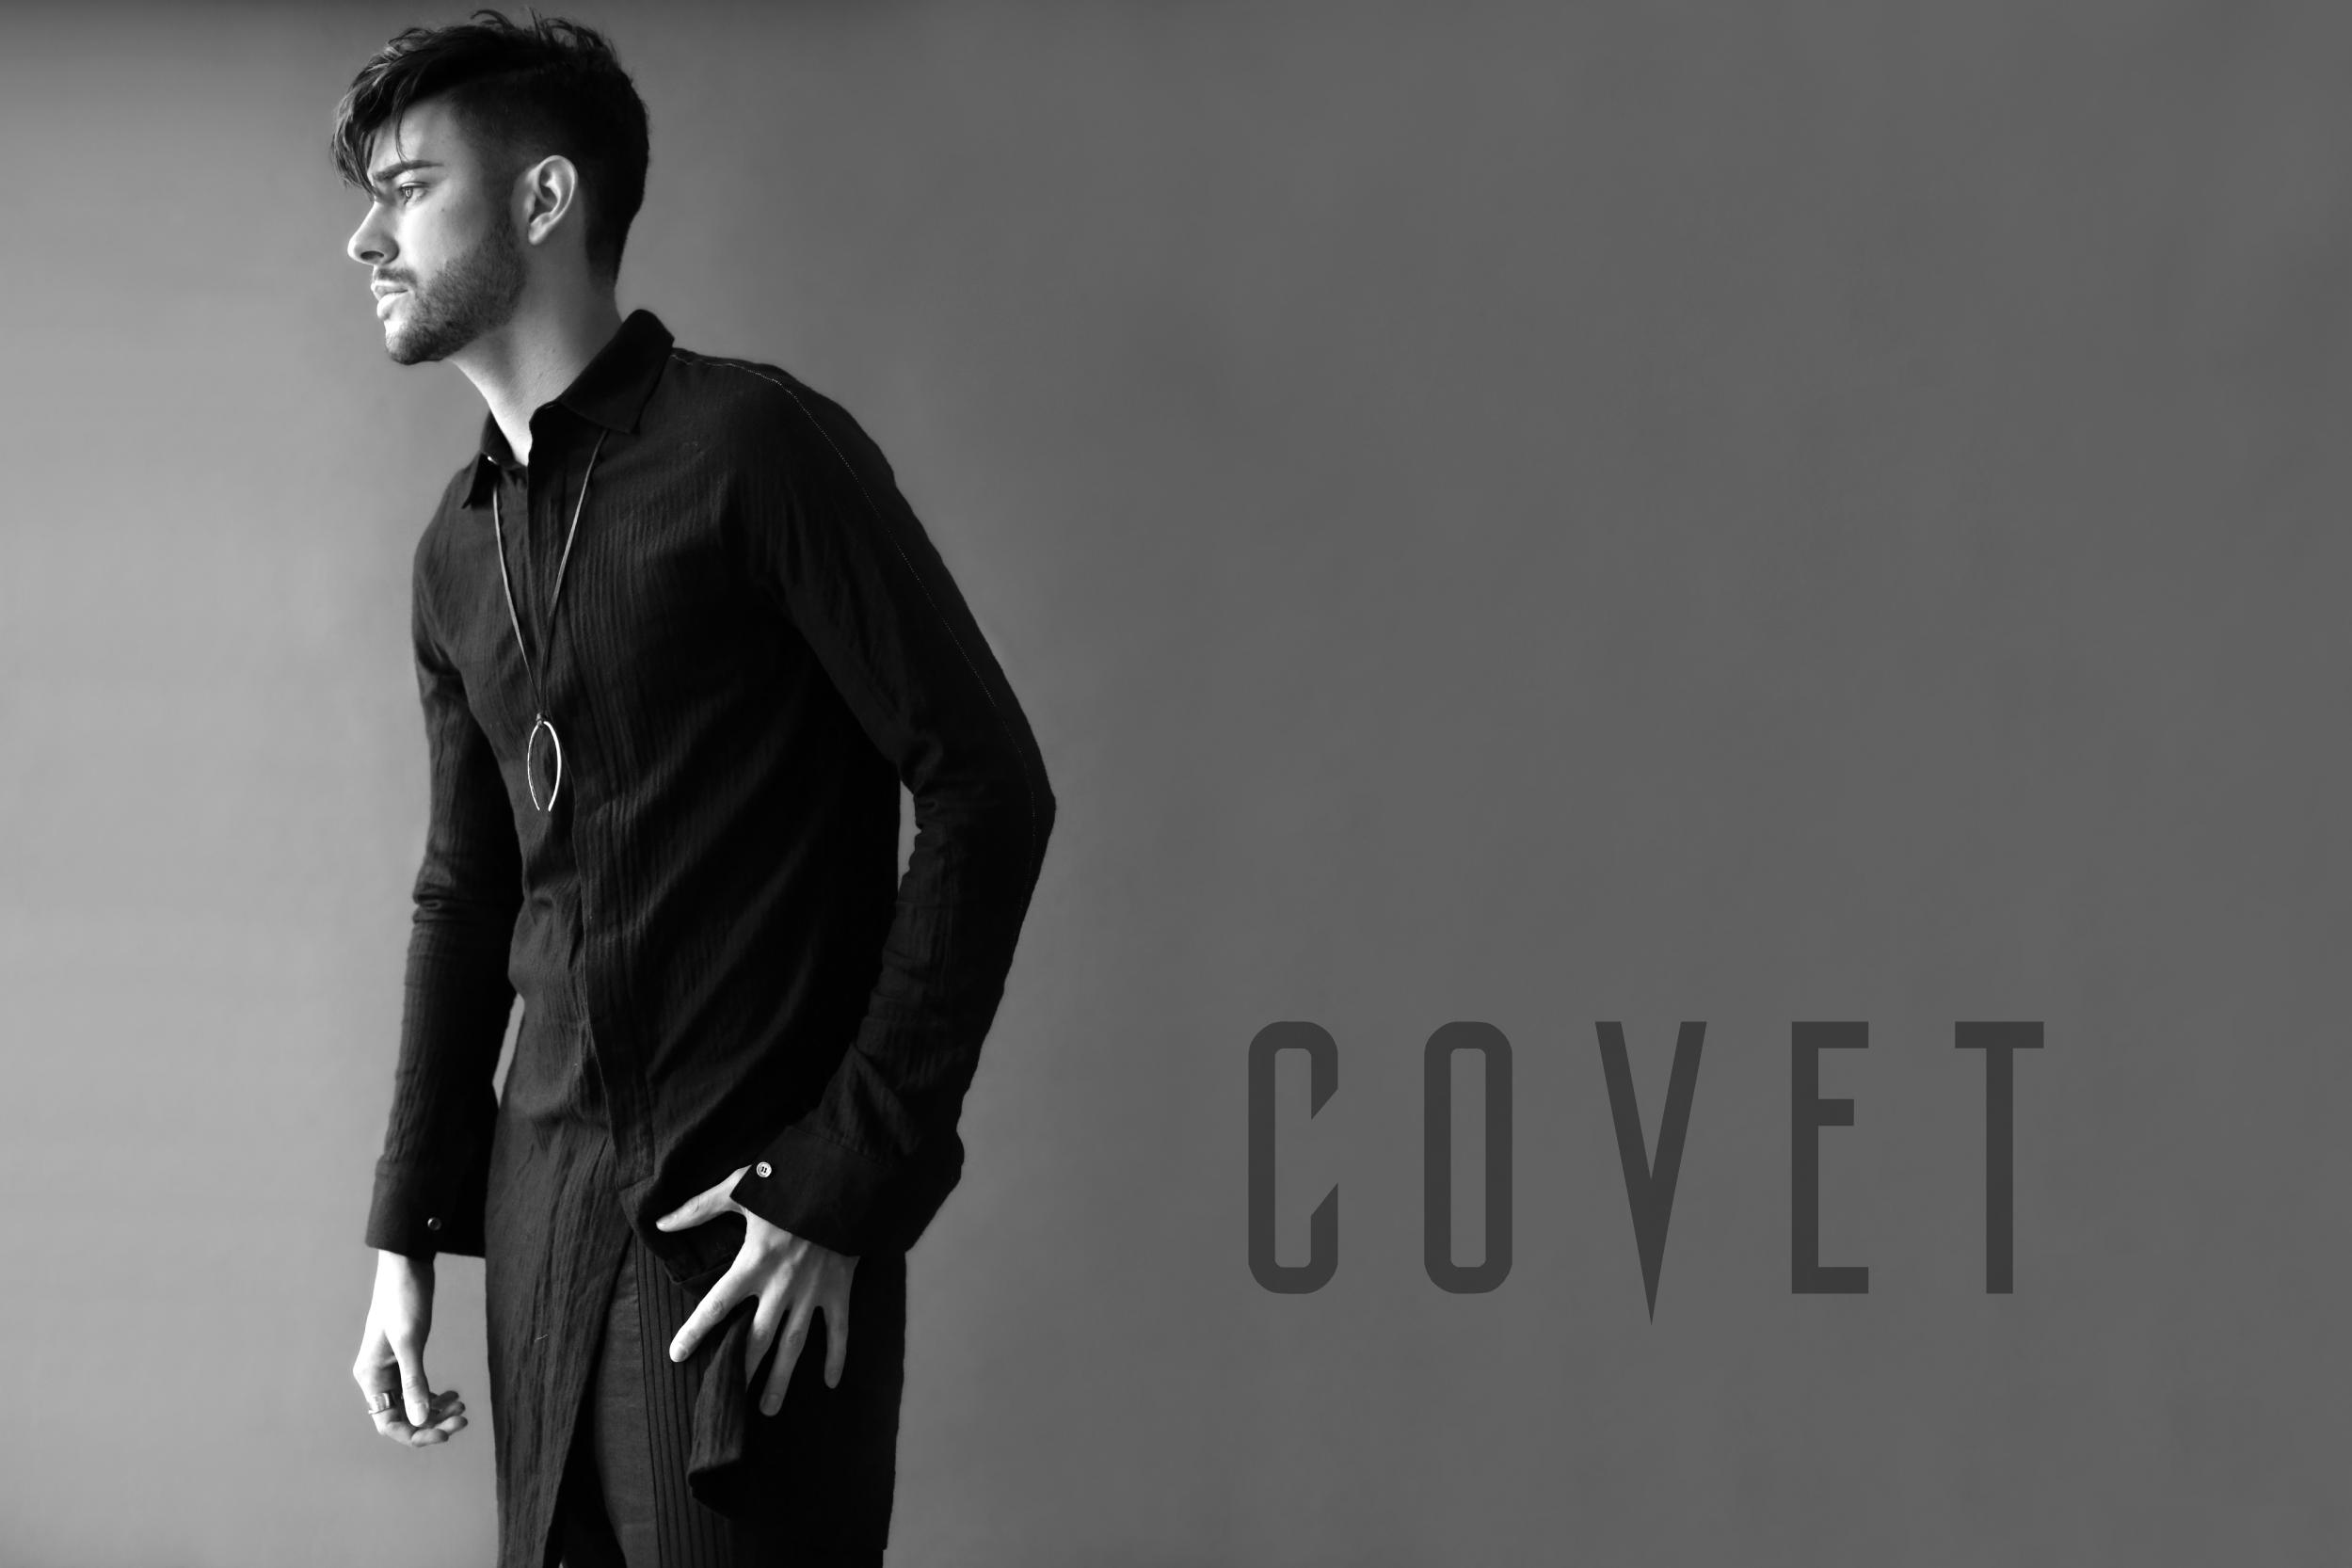 Covet-Campaign-Velvit-2.png